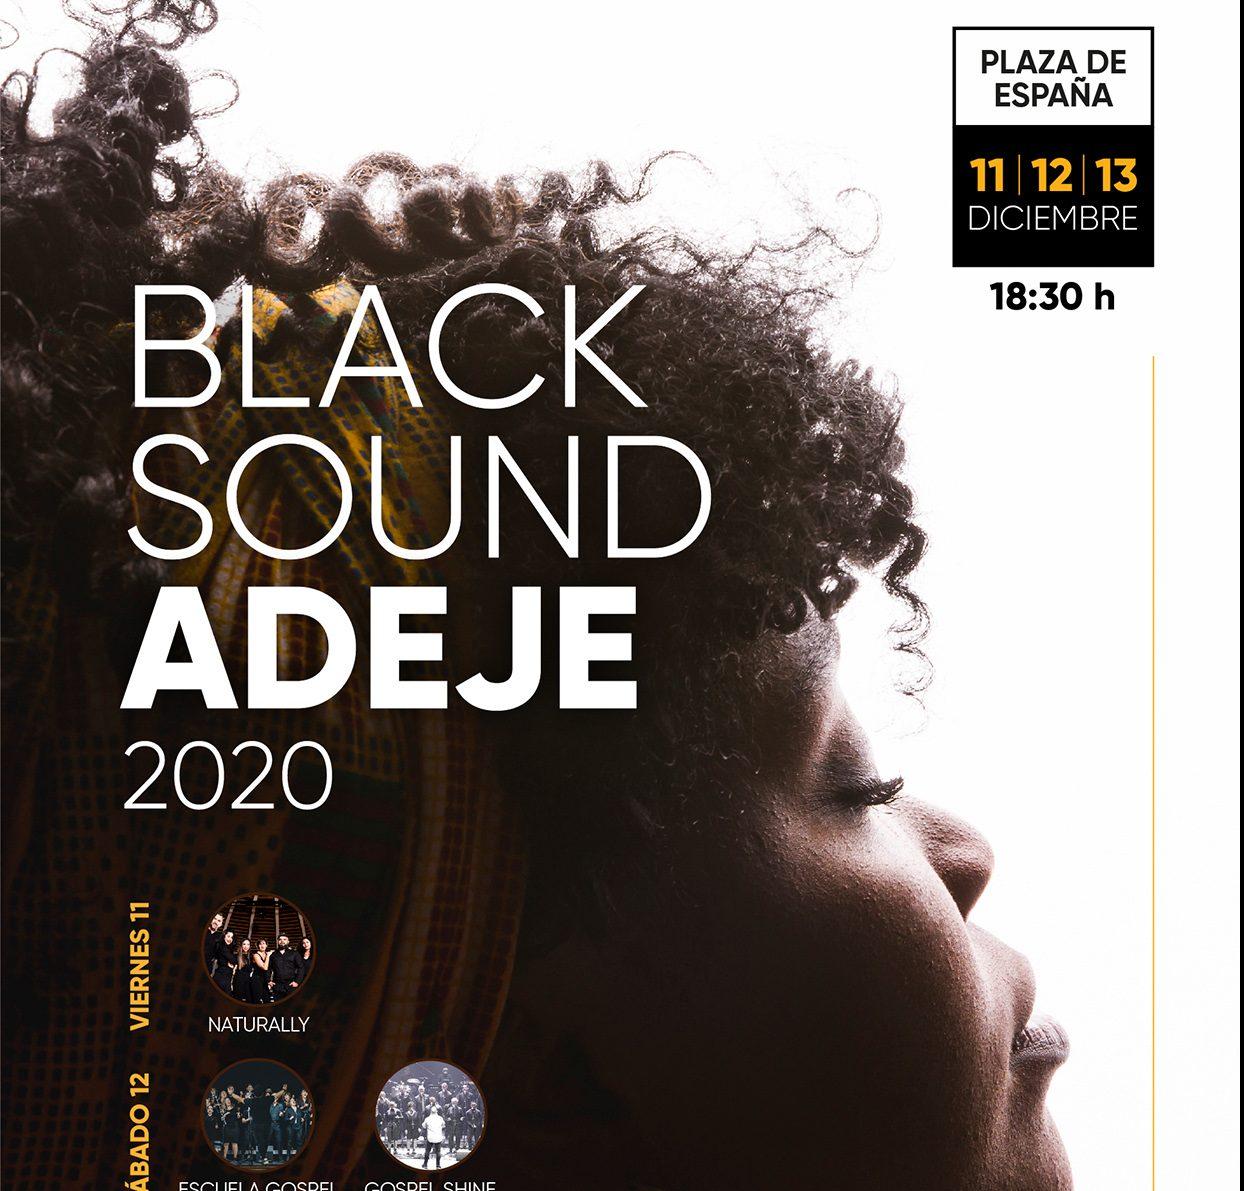 El festival Black Sound Adeje dedica un largo fin de semana a la mejor música afroamericana